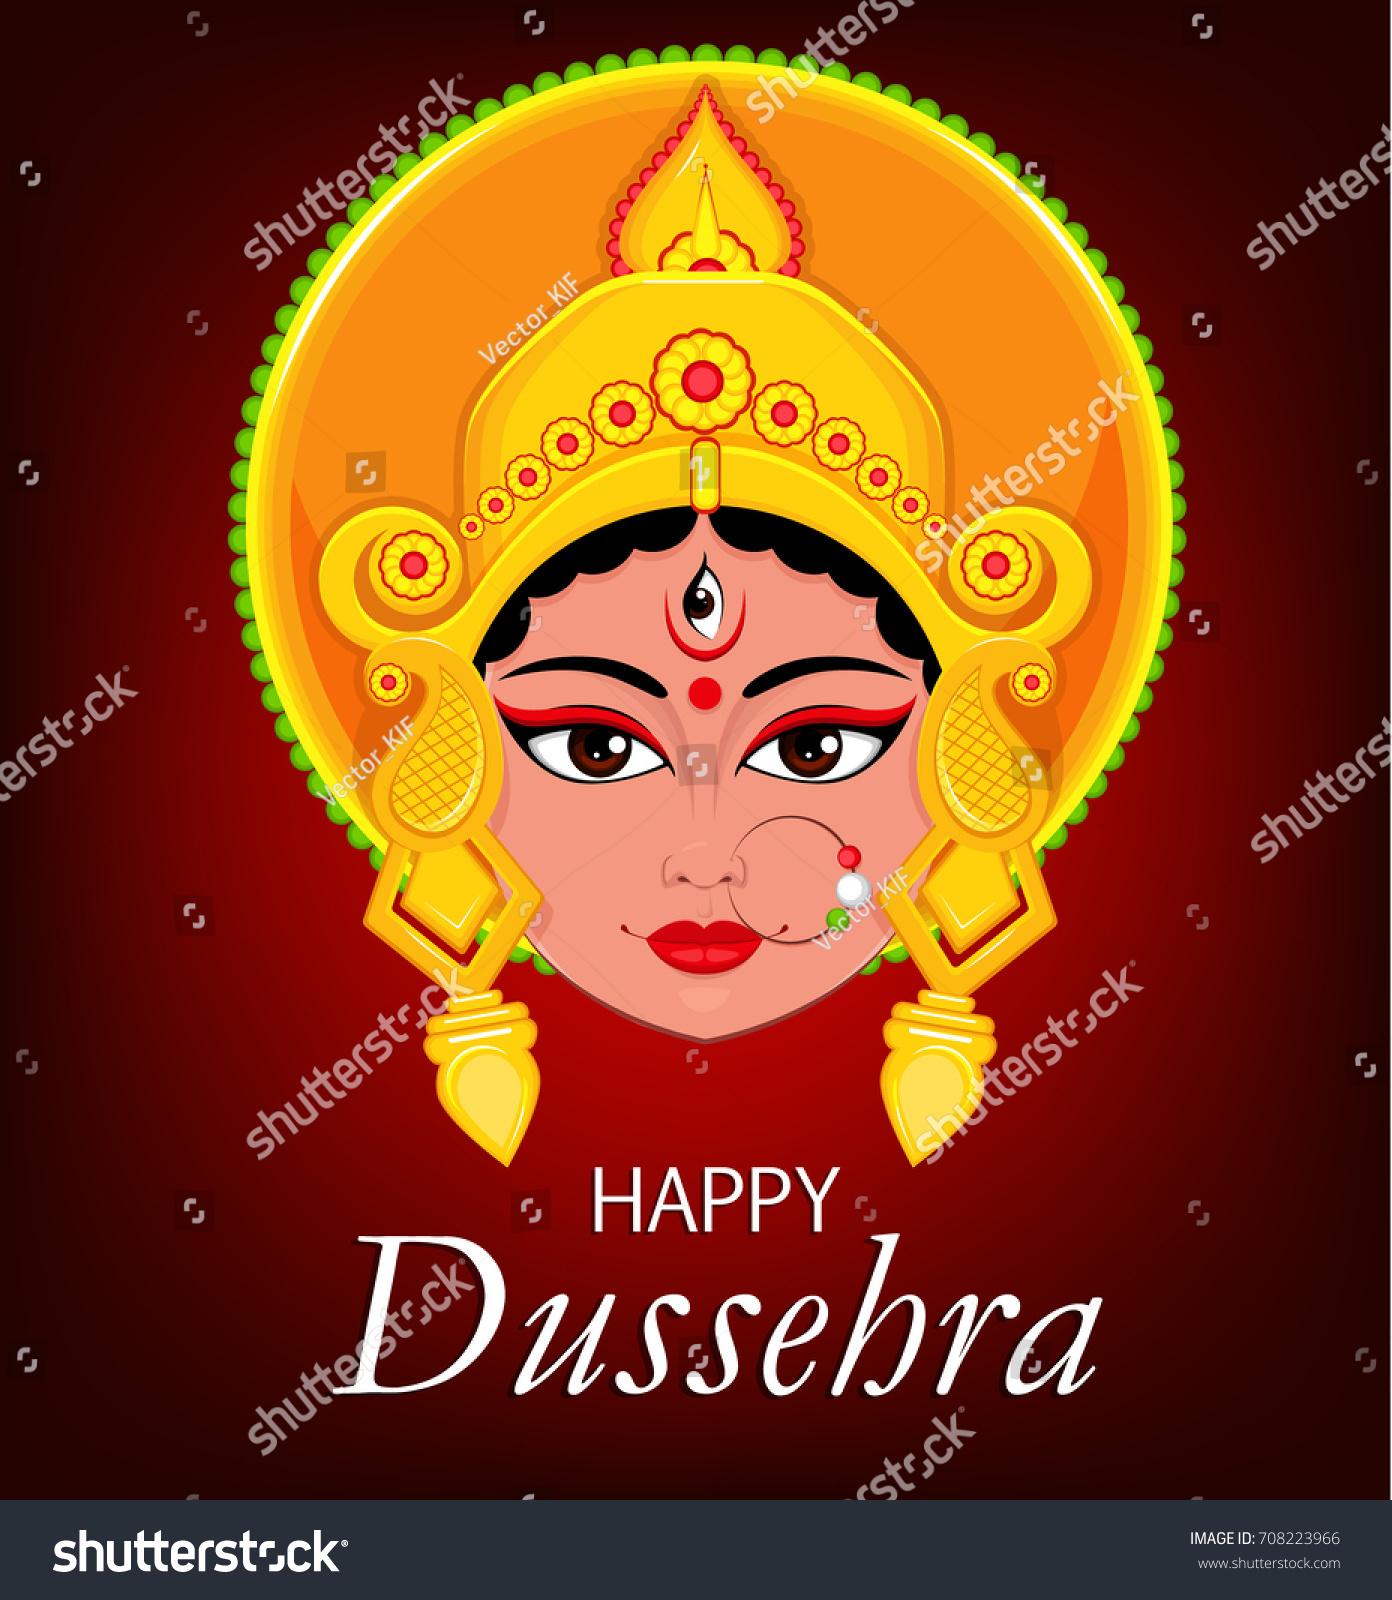 Happy Dussehra Greeting Card Maa Durga Stock Vector Hd Royalty Free